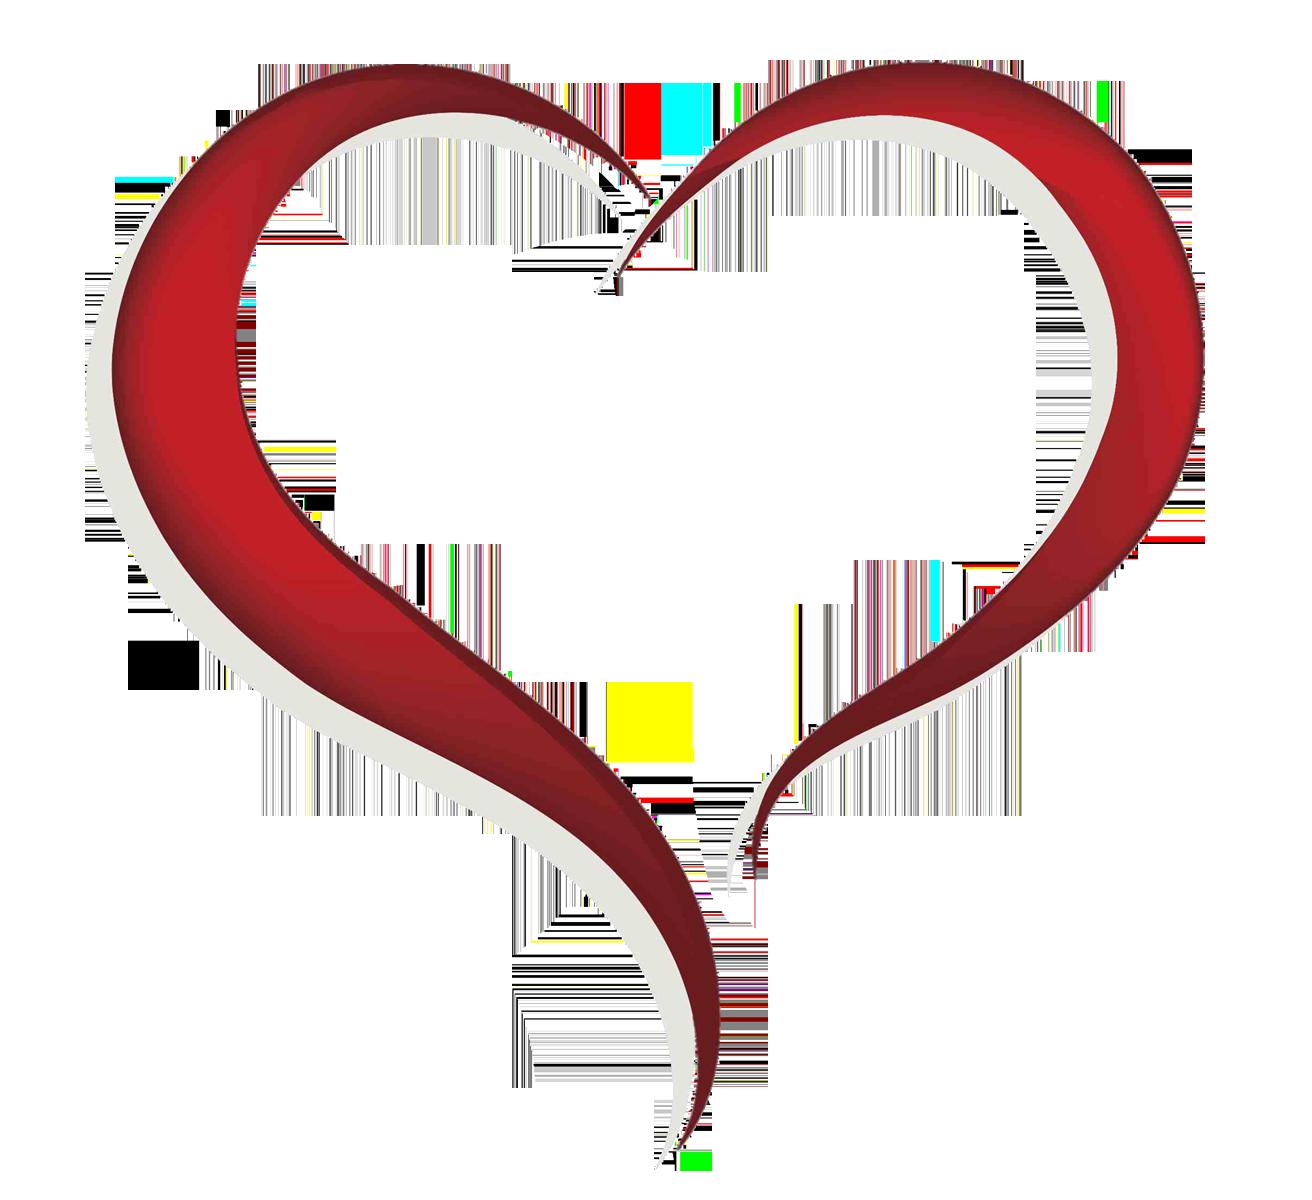 Heart-shaped clipart open heart #8